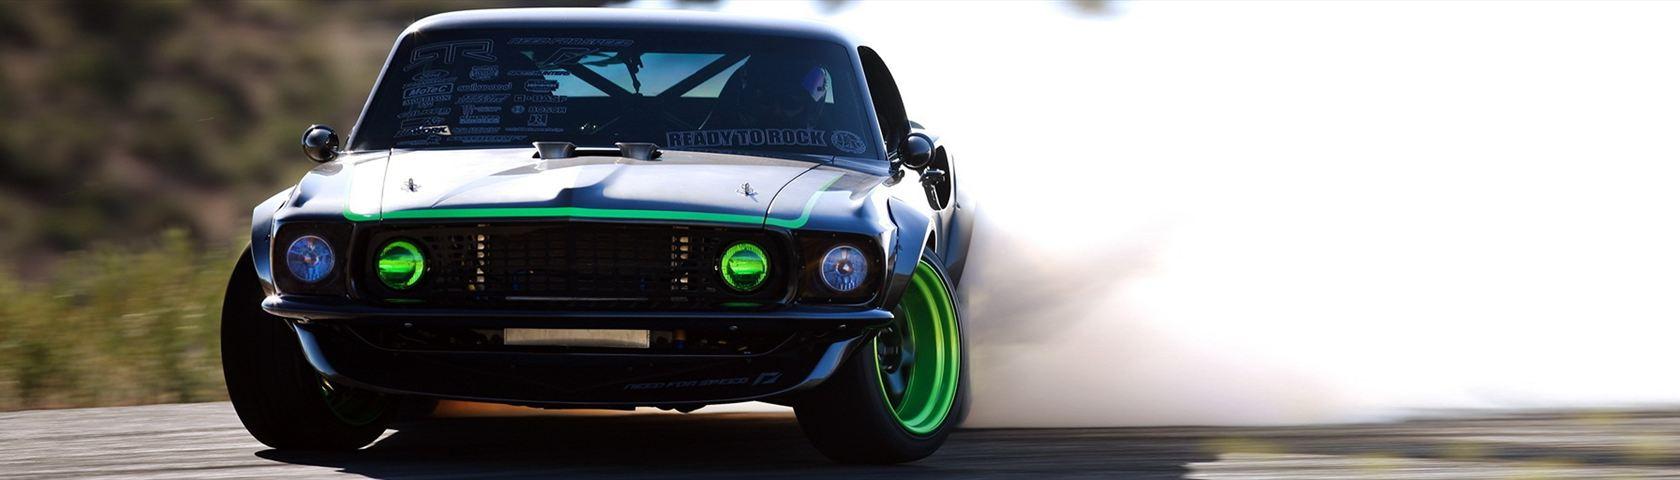 Drifting Mustang